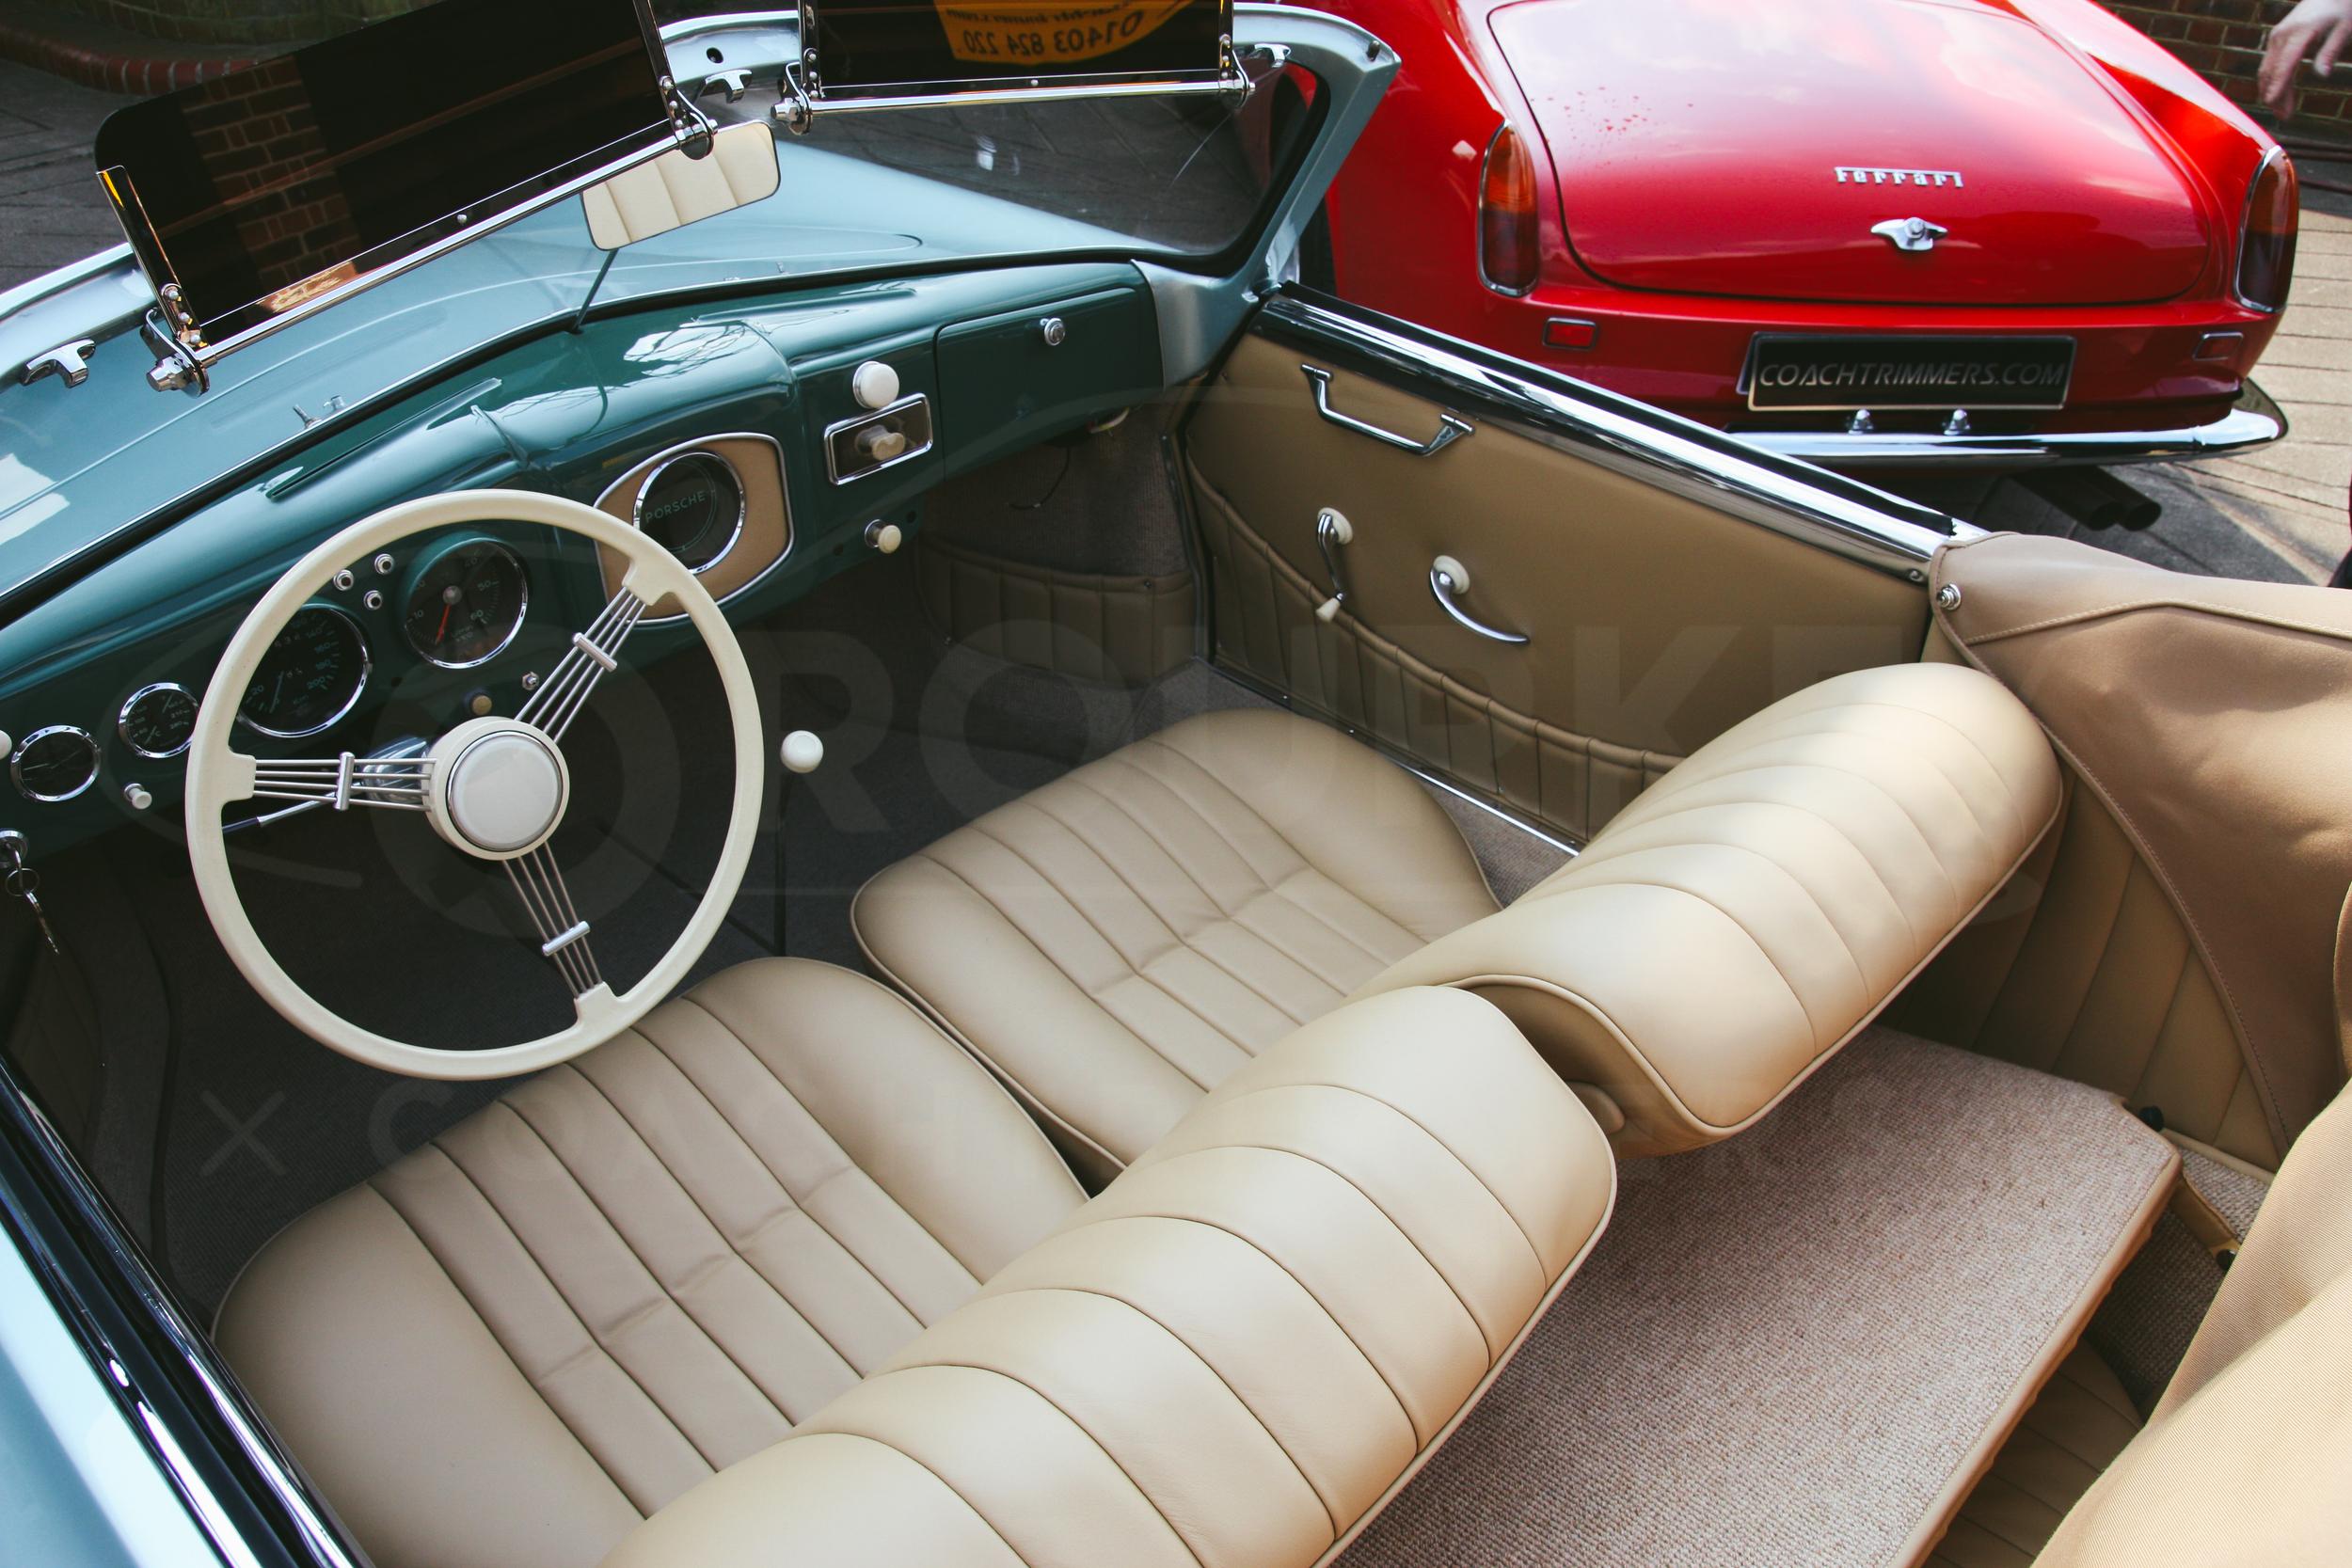 o-rourke-coachtrimmers-porsche-356-cabriolet-11.jpg